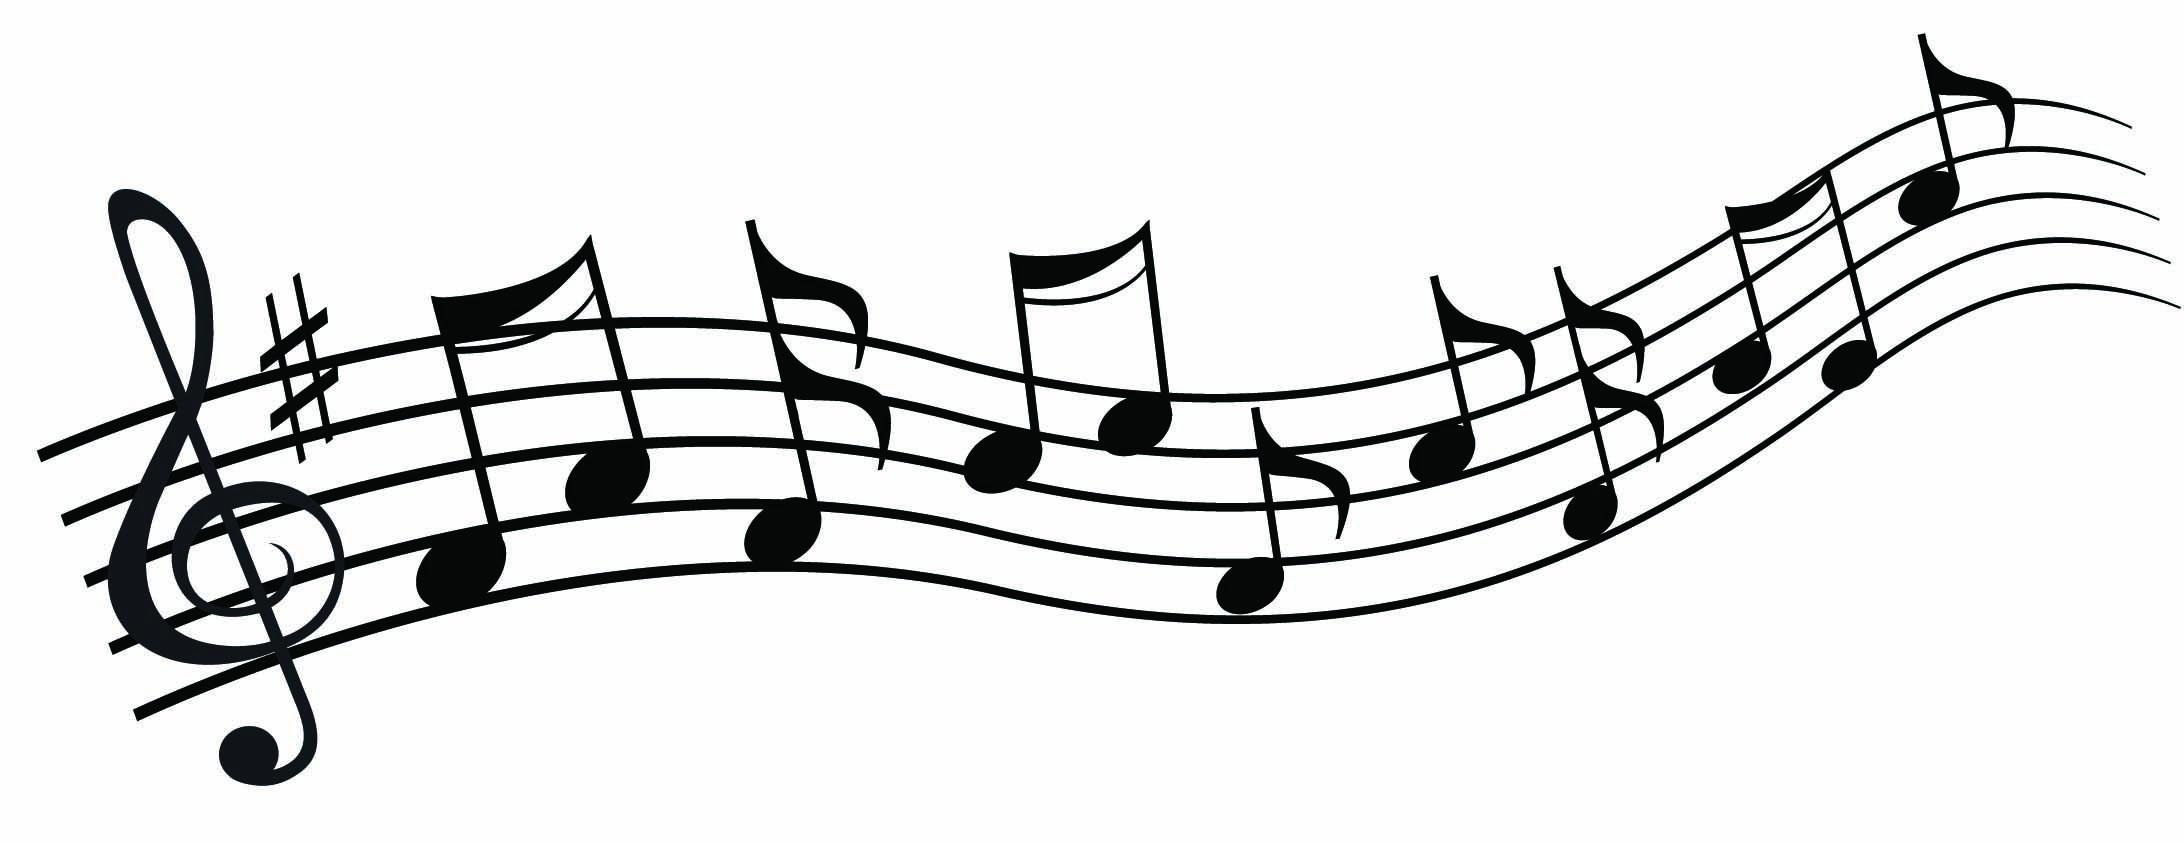 Music Score Clip Art